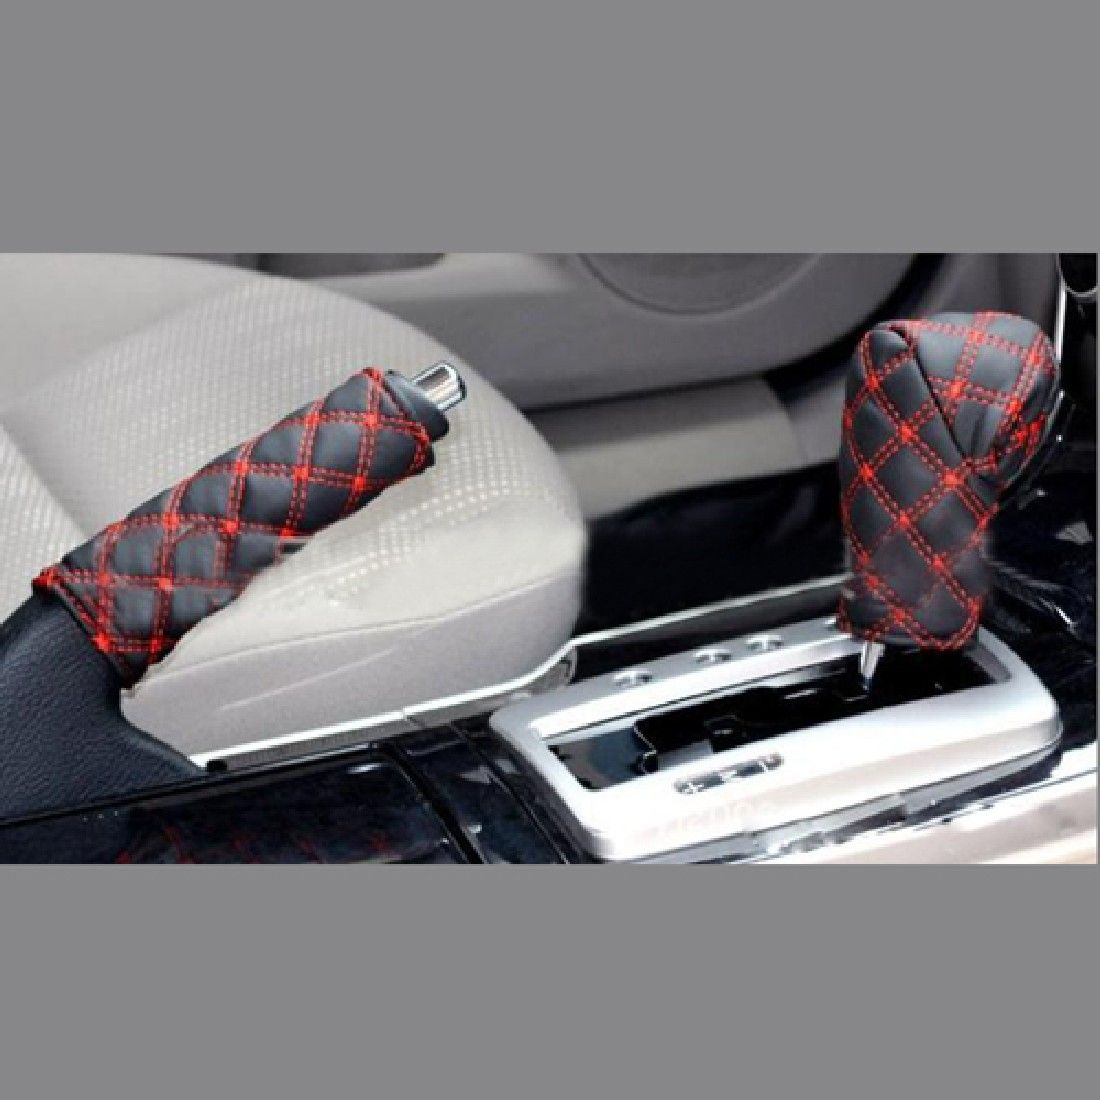 Set Auto Car Accessory Decoration Gear Set Hand Brake Covers Grid Microfiber